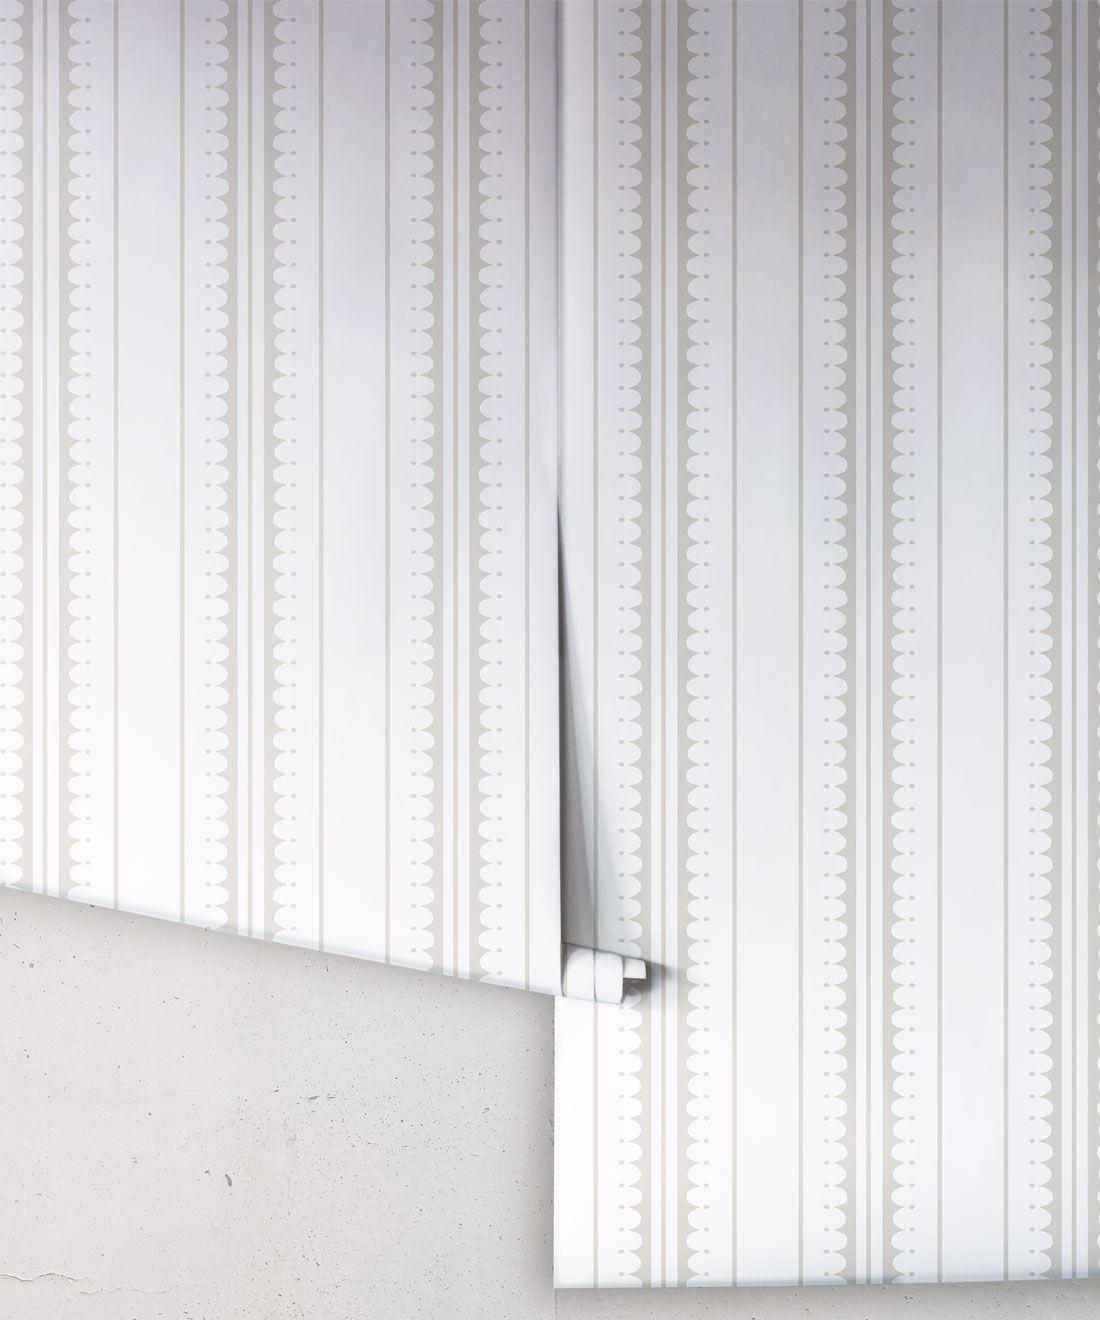 Coquille Wallpaper • Stripe and Scallop Wallpaper • Beige • Rolls